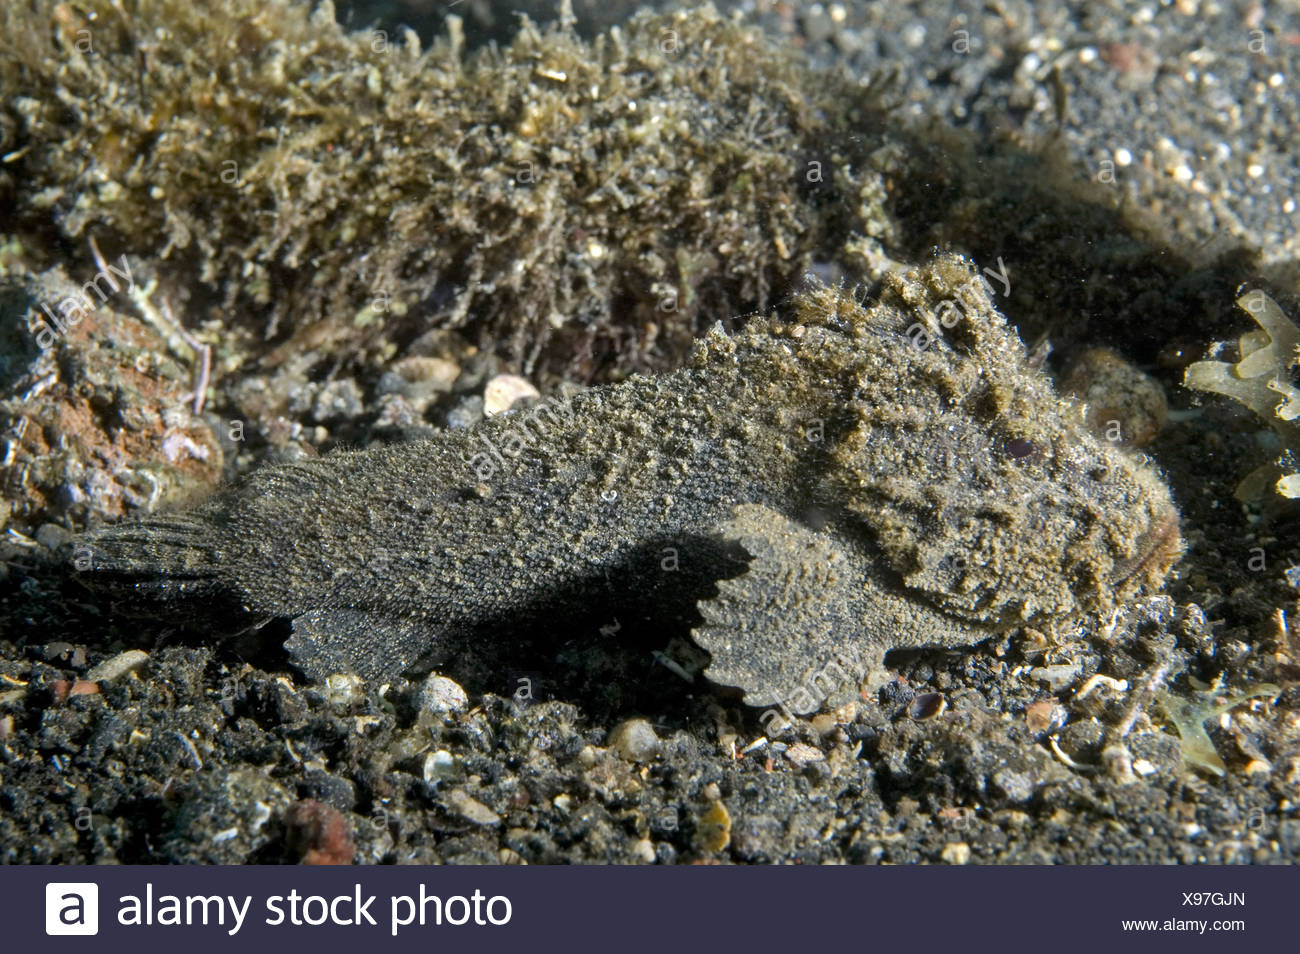 Phantom Velvetfish Paraploactis kagoshimensis Muck Black Sand Lembeh Marine Sea Diving Manado Sulawesi Indonesia animal animals - Stock Image